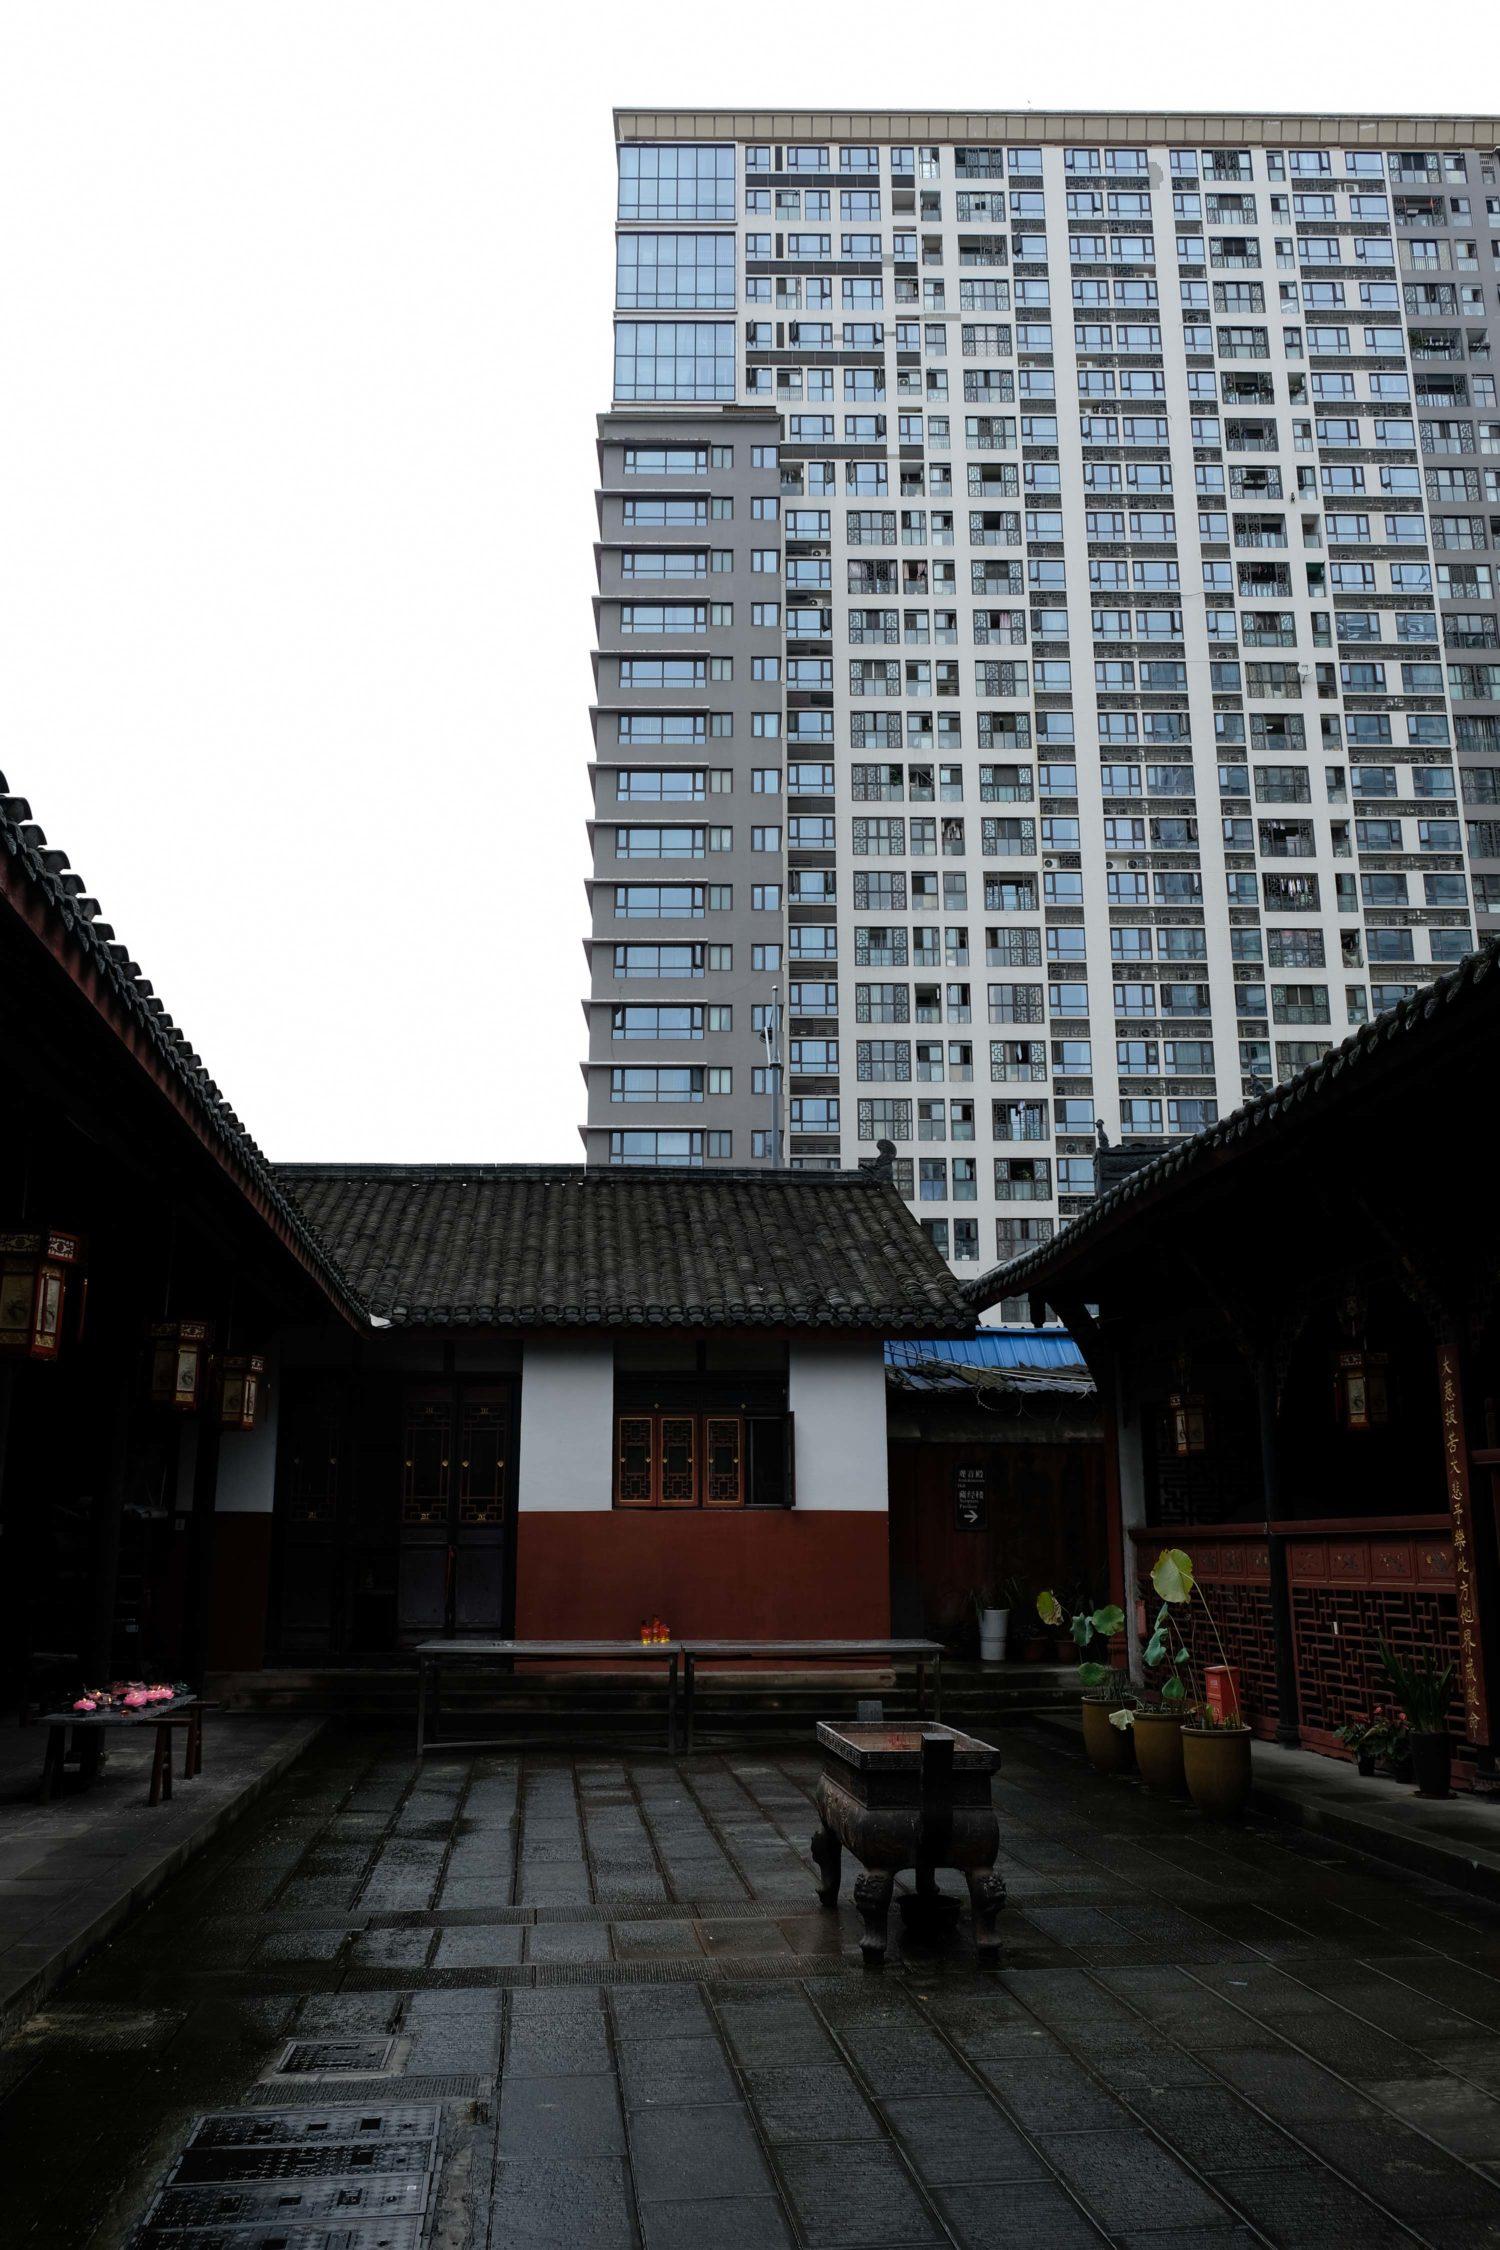 Jinsha nunnery Chengdu